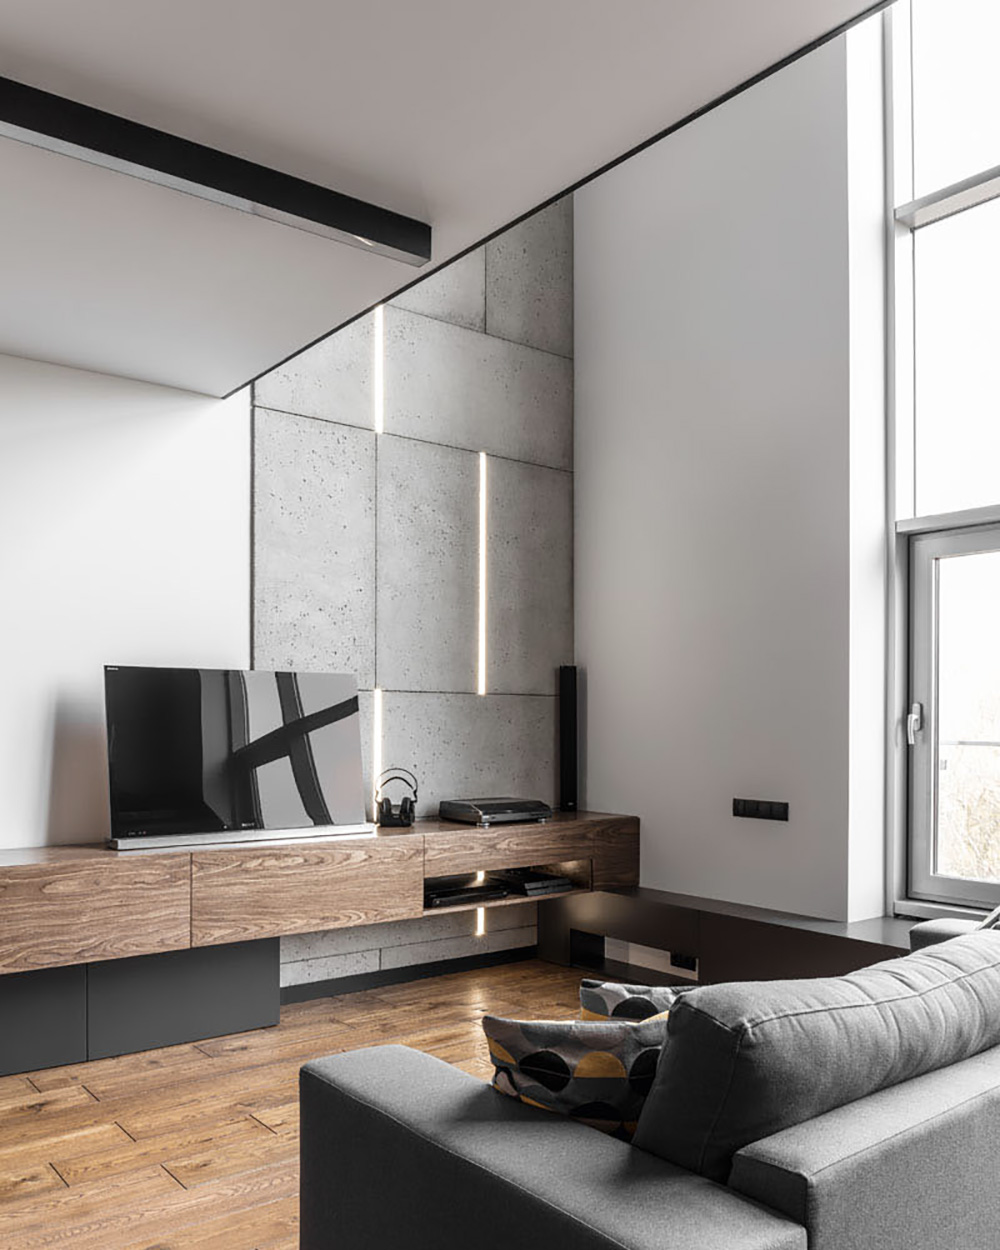 Un loft mezzanine contemporain | Shake My Blog